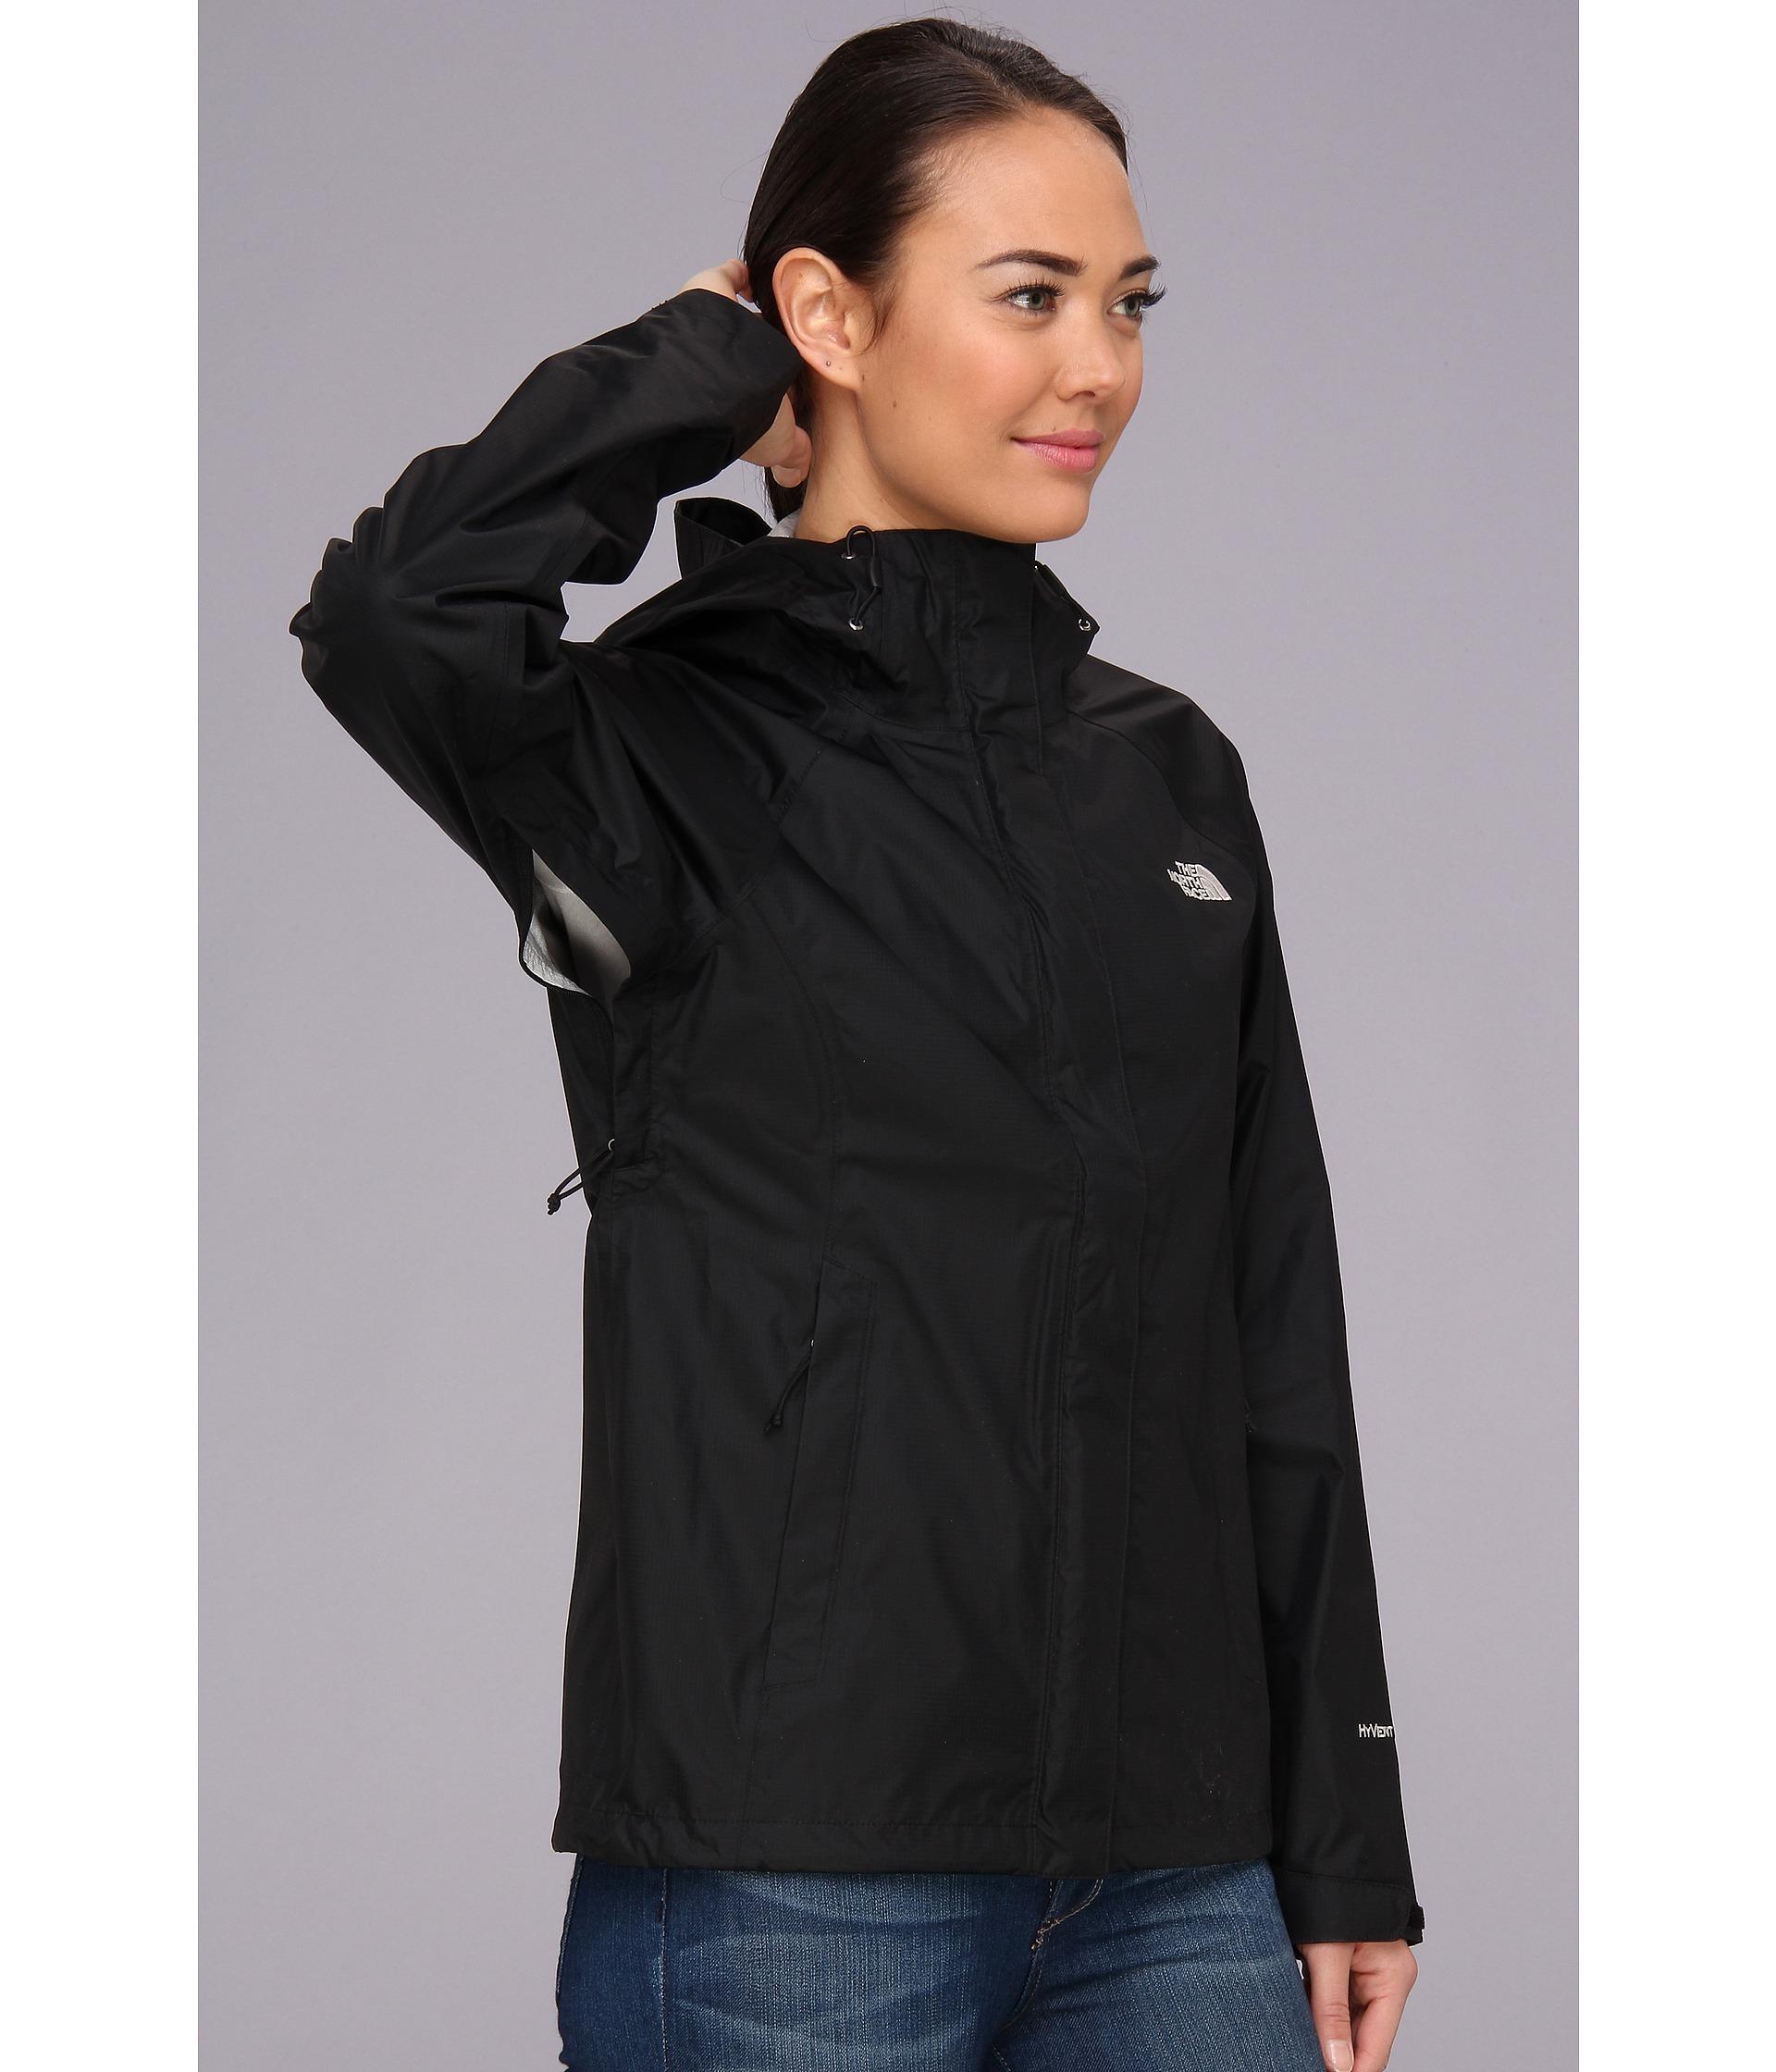 North face women venture jacket